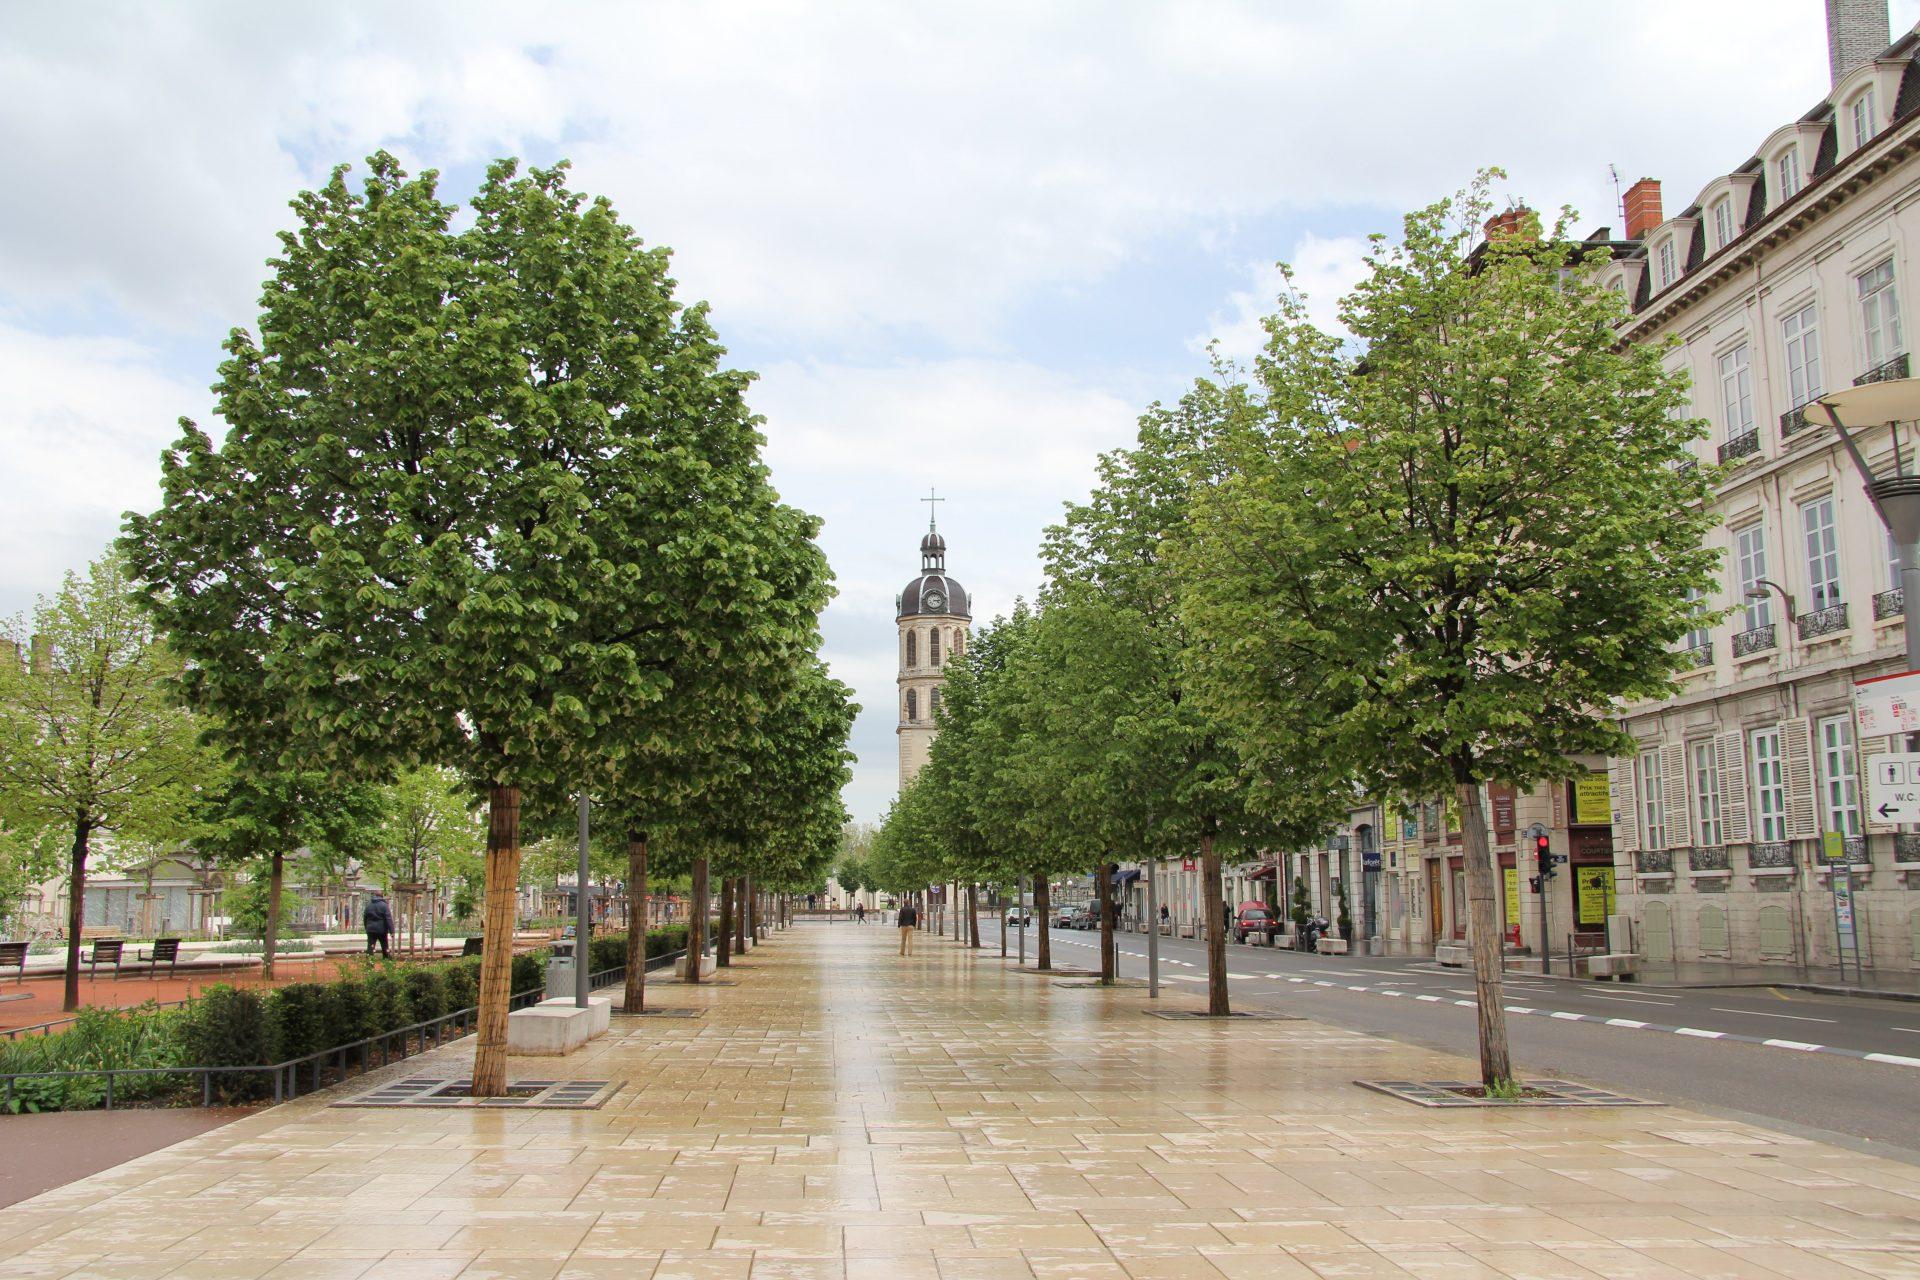 Вид на колокольню с Площади Белькур, Лион, Франция. Май, 2013